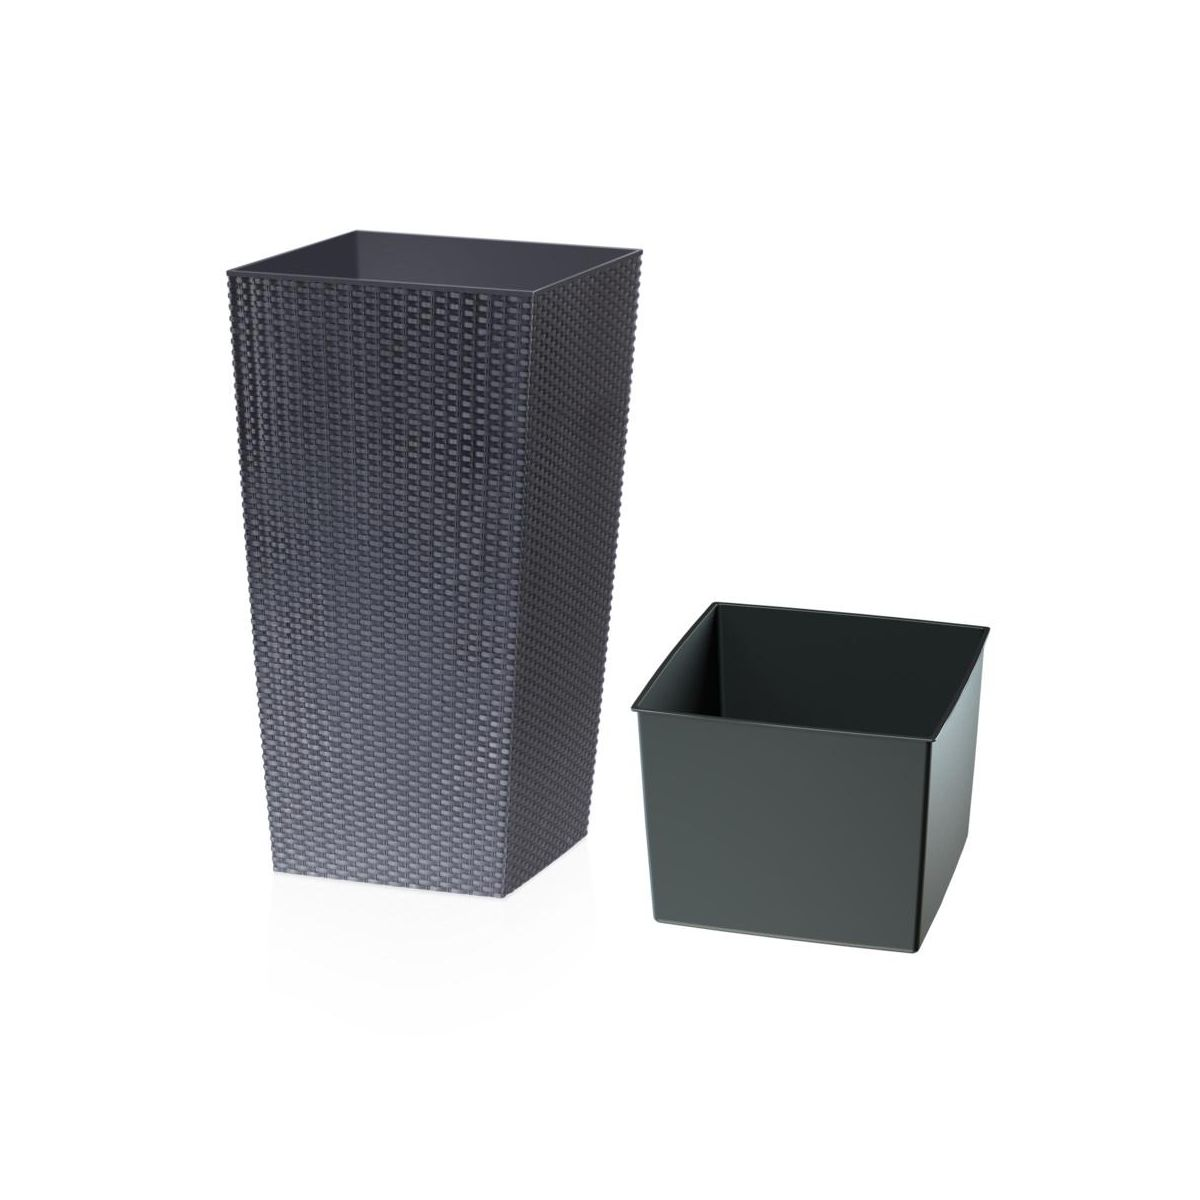 os onka rato square 26 5 x 26 5 cm prosperplast os onki w atrakcyjnej cenie w sklepach leroy. Black Bedroom Furniture Sets. Home Design Ideas